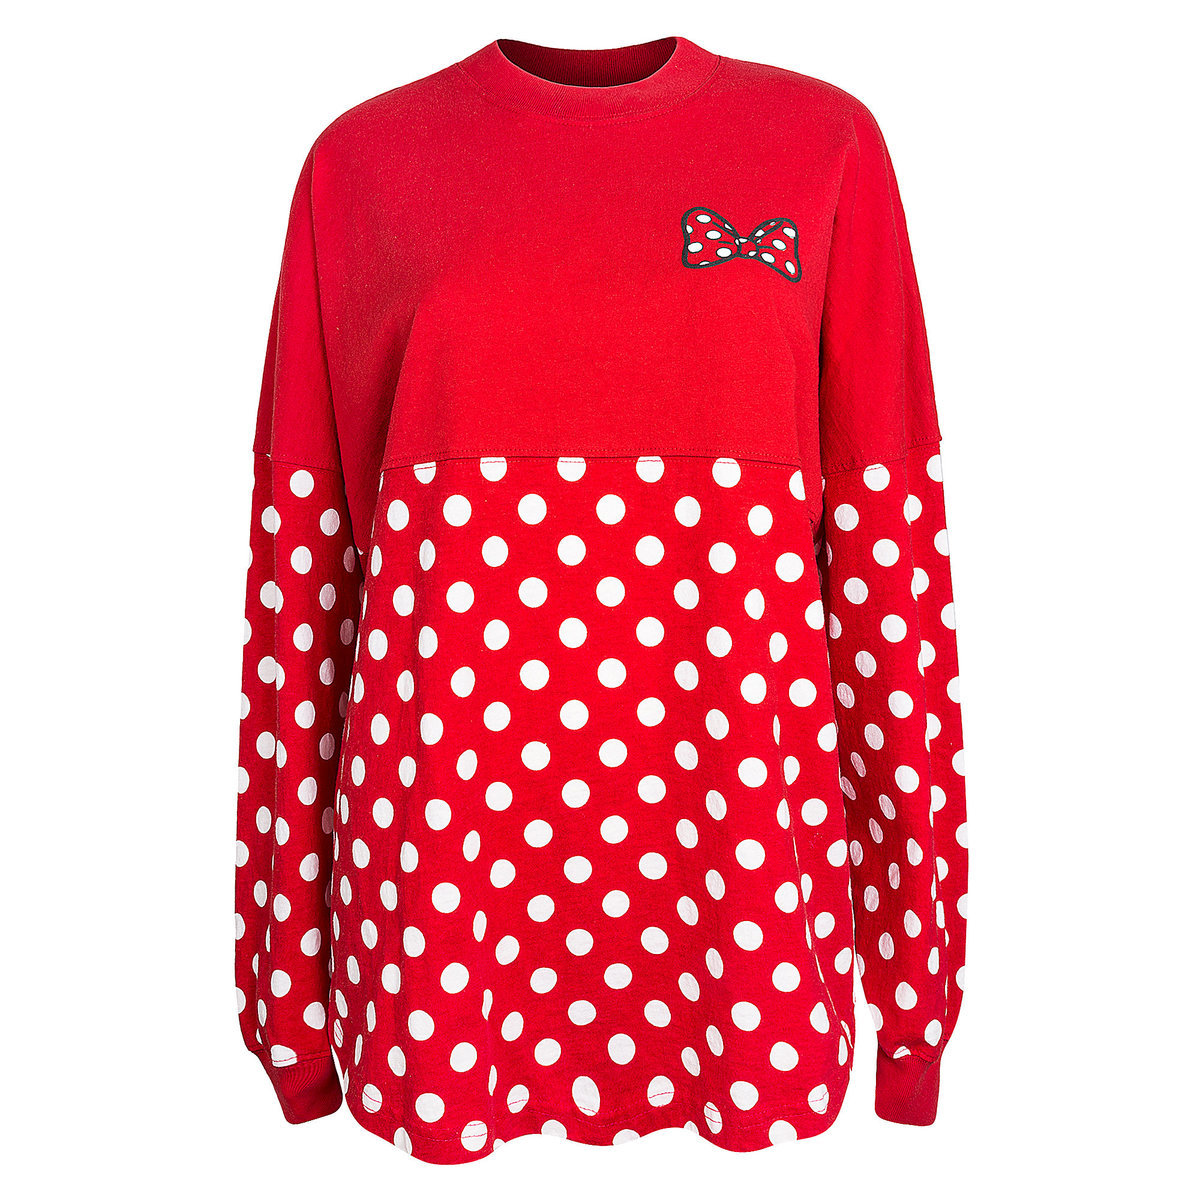 04d5da3c217 Product Image of Minnie Mouse Polka Dot Spirit Jersey for Adults - Walt  Disney World #